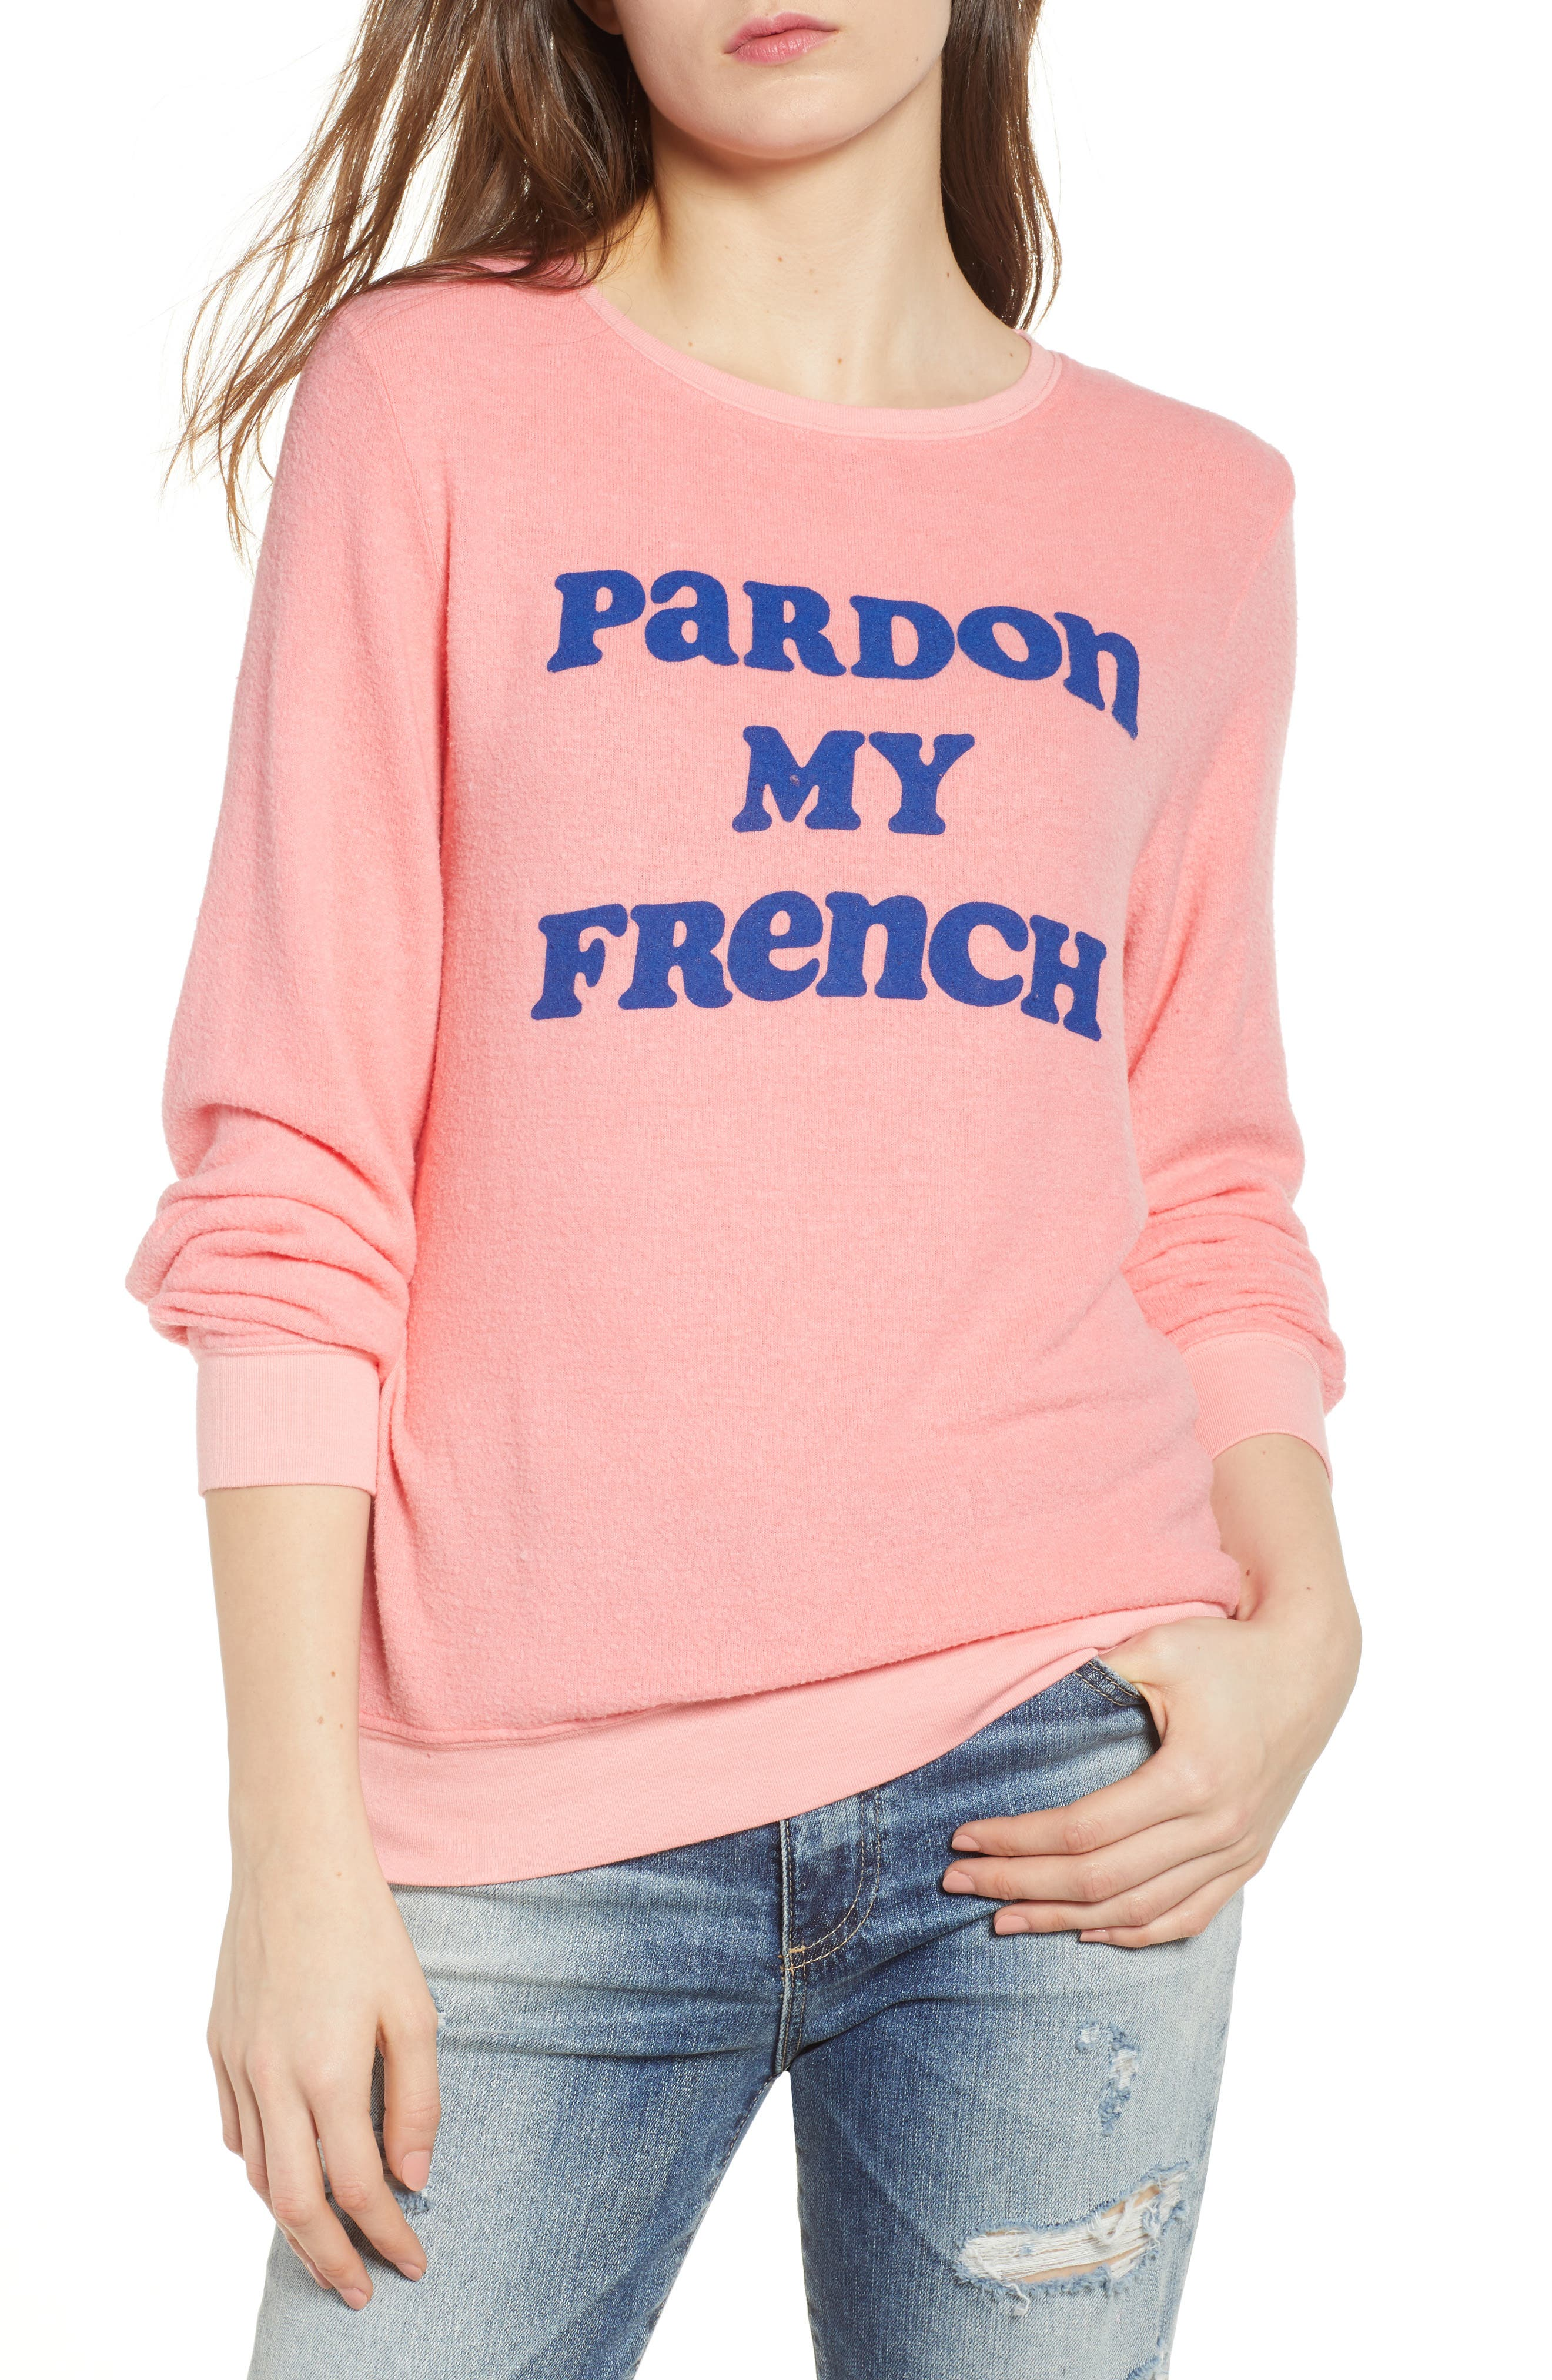 Pardon My French Sweatshirt,                             Main thumbnail 1, color,                             Peach Crush